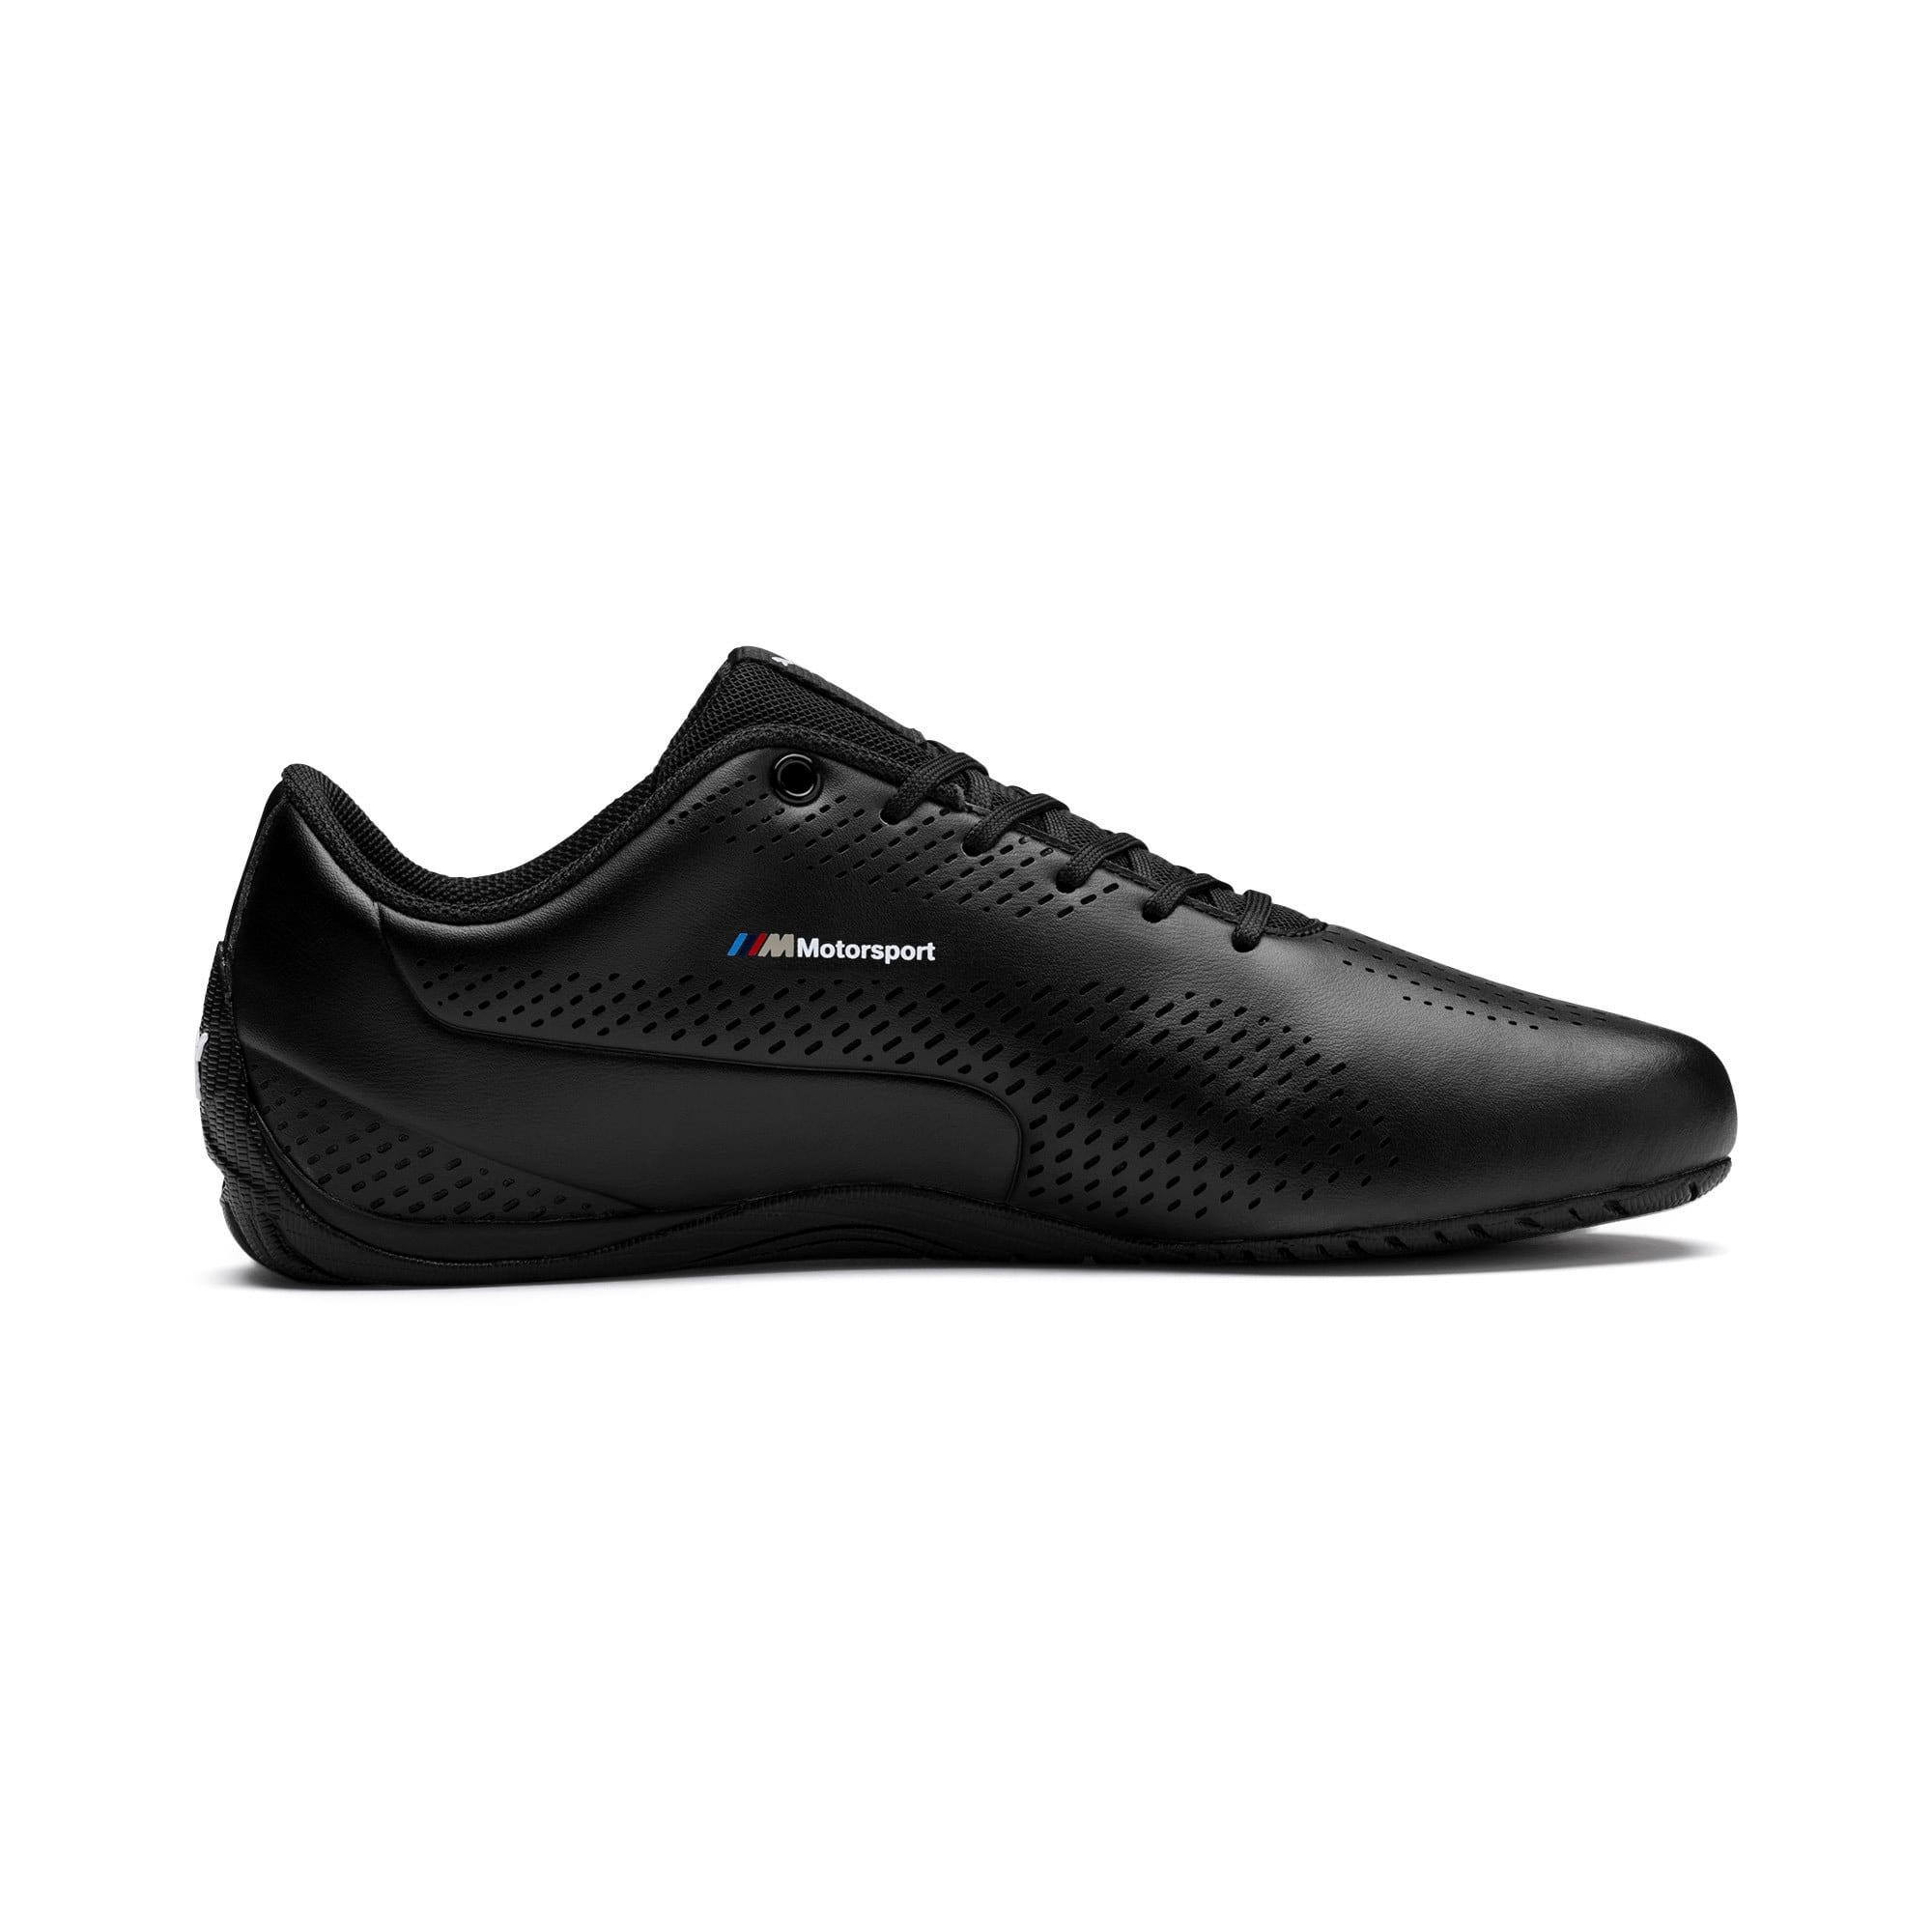 Thumbnail 5 of BMW M Motorsport Drift Cat 5 Ultra II Men's Shoes, Puma Black-Puma Black, medium